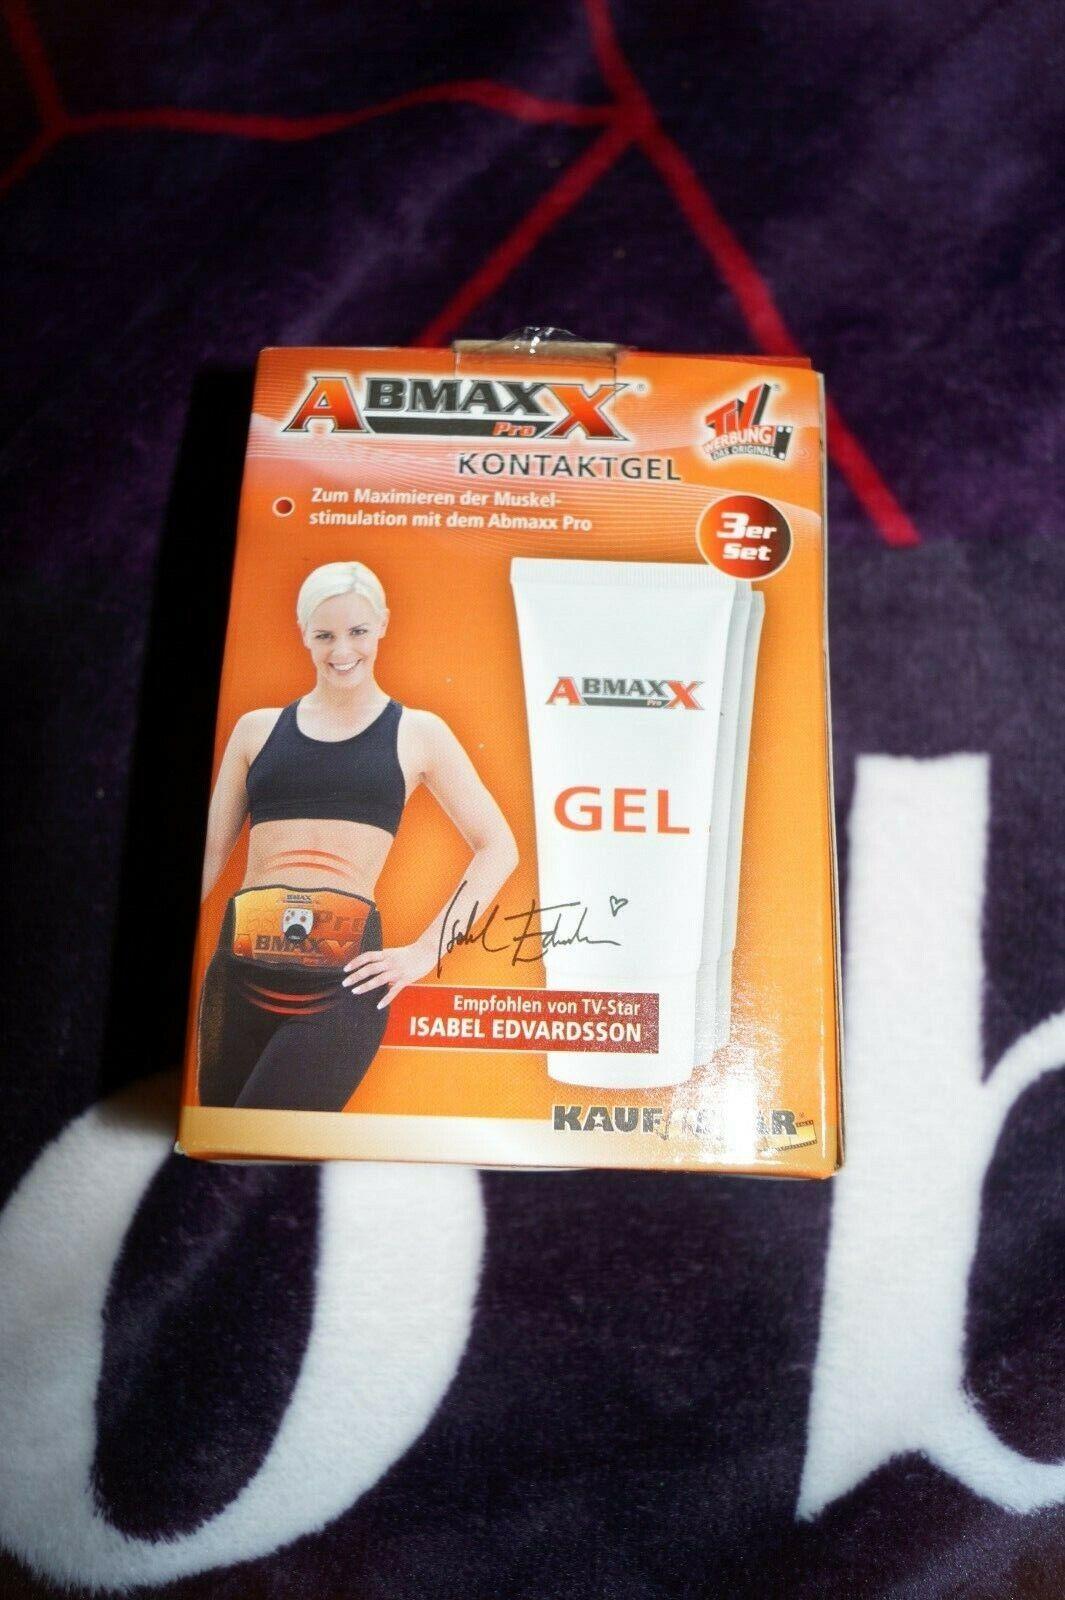 Kontaktgel Abmaxx Pro Muskelstimulation Bauchgürtel Gel Sportgürtel OVP